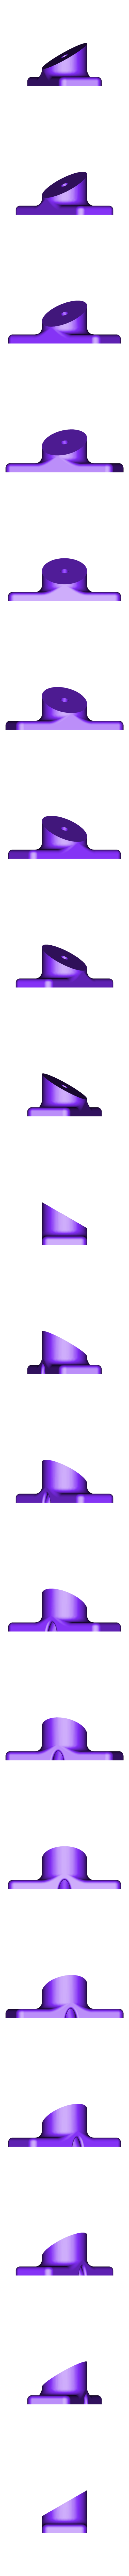 spool_holder_base_xl.stl Download free STL file Spool holder for 2020 Extrusions (Deltas) • Model to 3D print, AlkinsDesigns